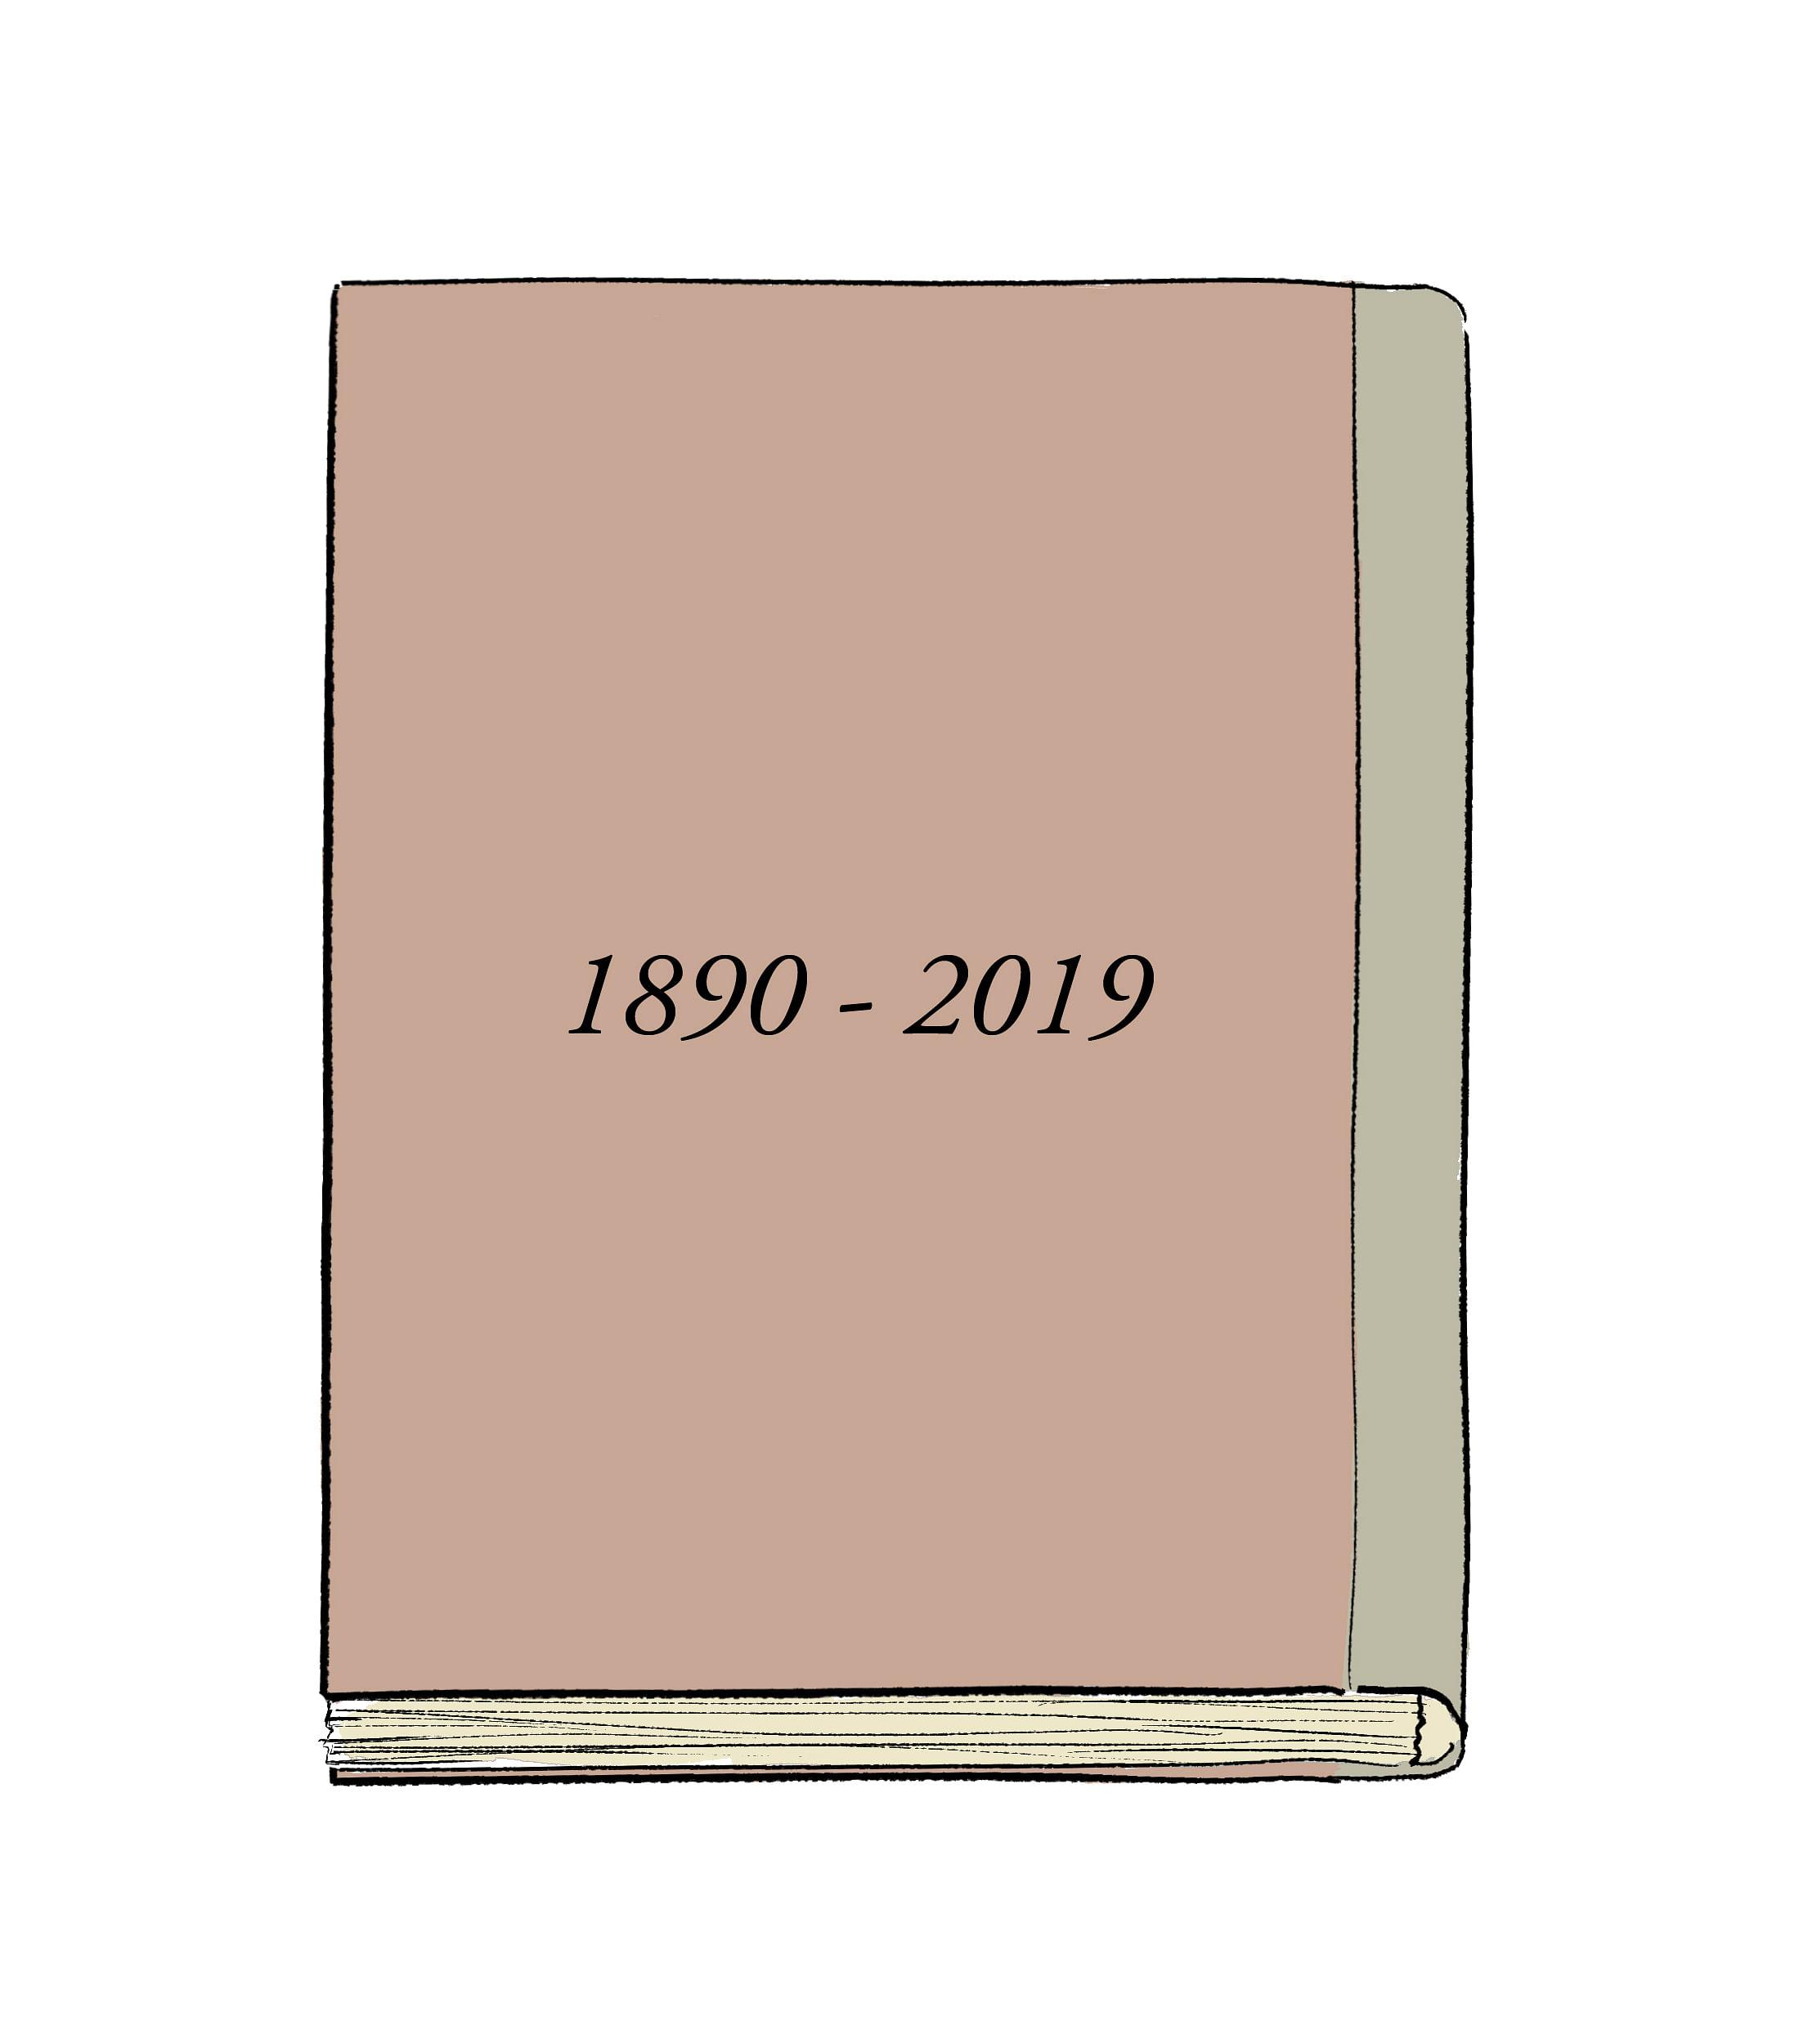 20190712_singapore_mph-bookstore-closing-07-mobile.jpg